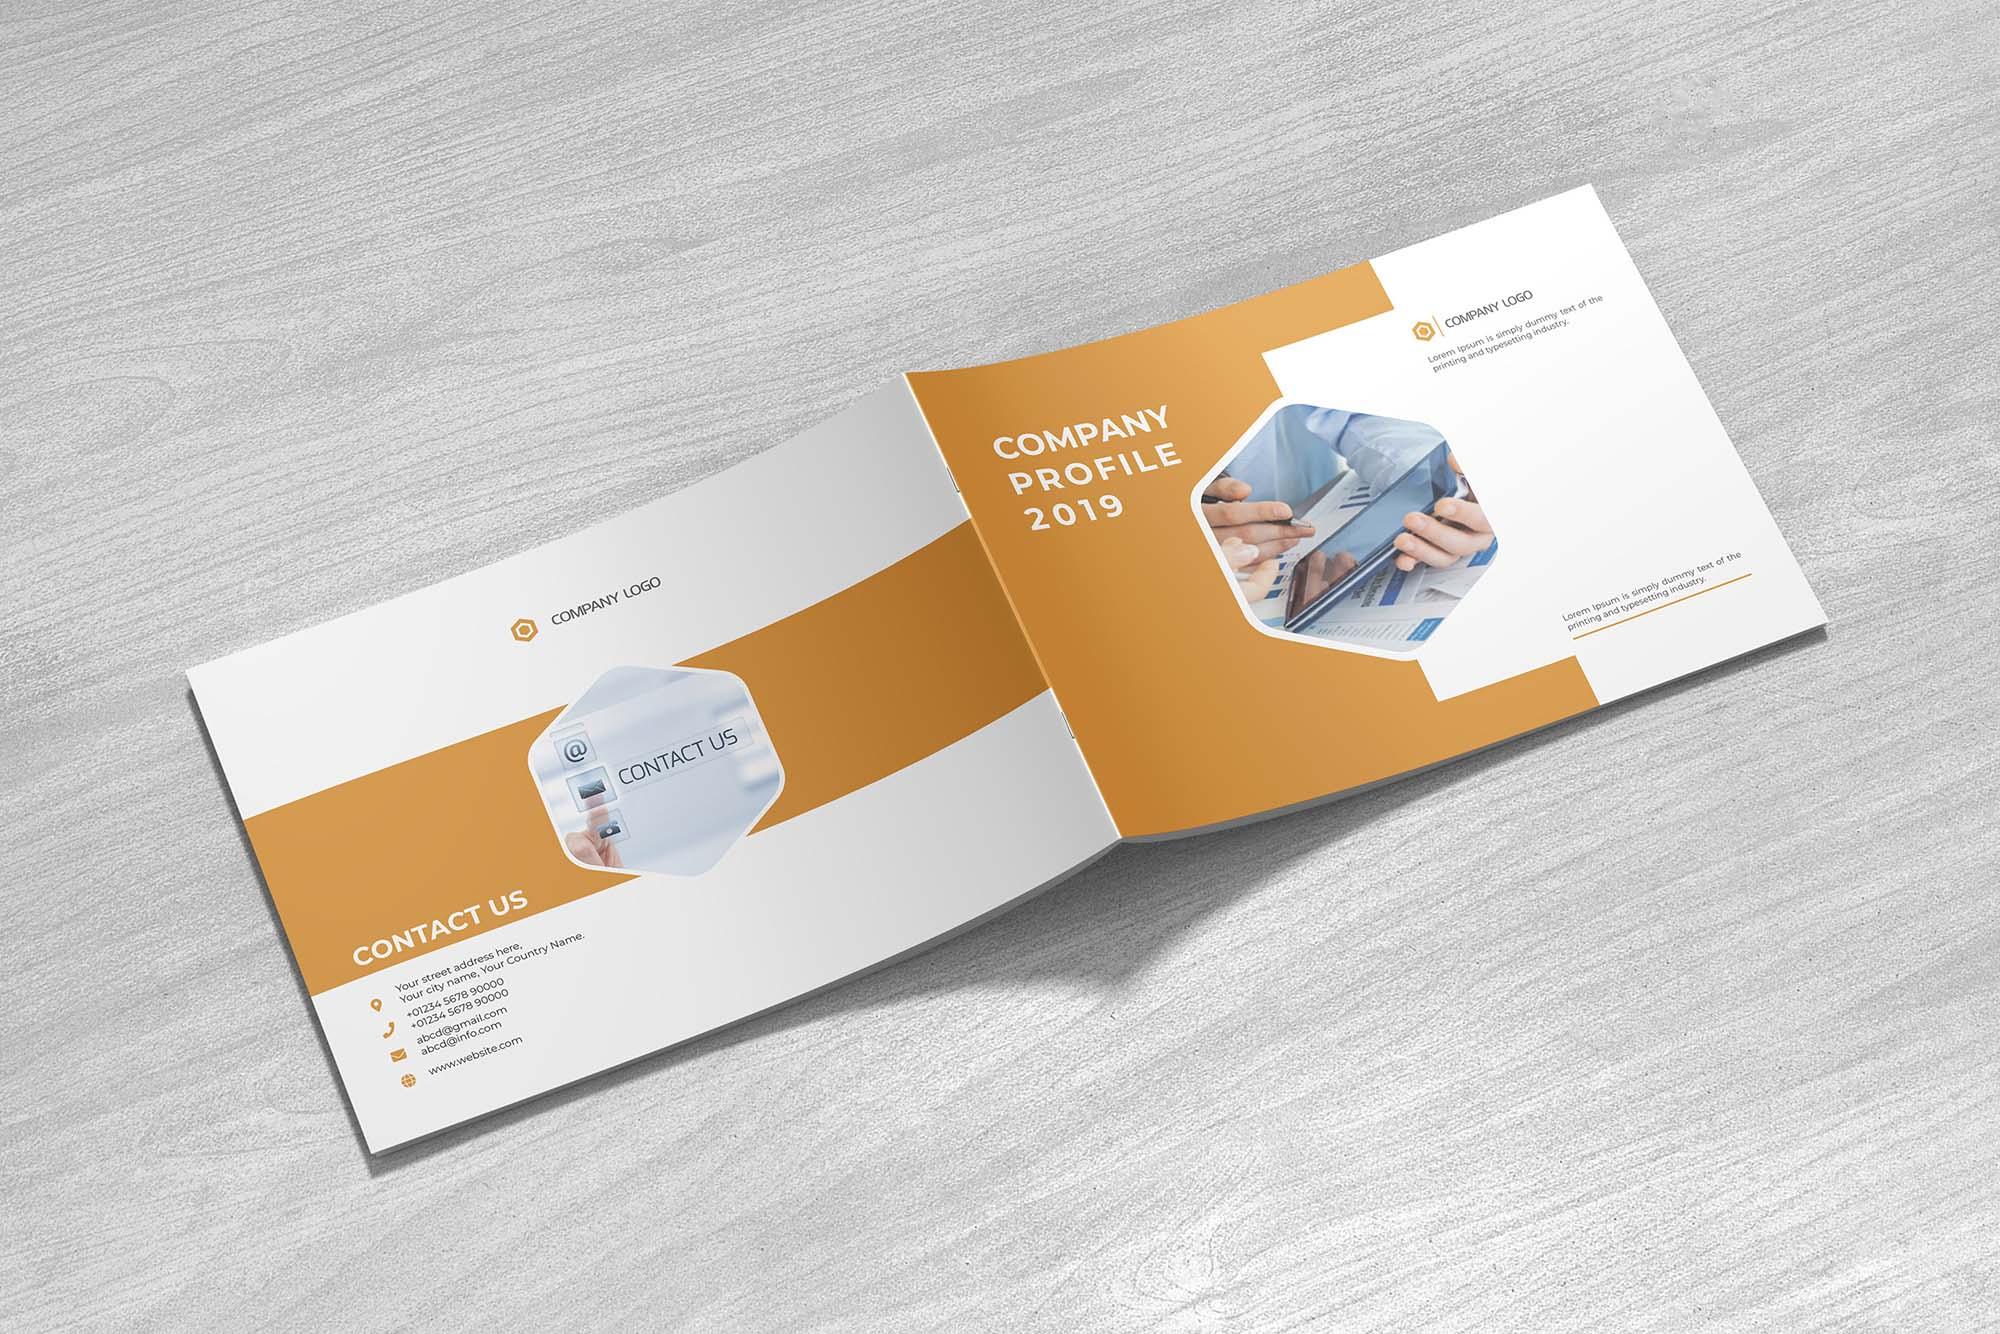 Landscape Company Profile Template & Mockup 6